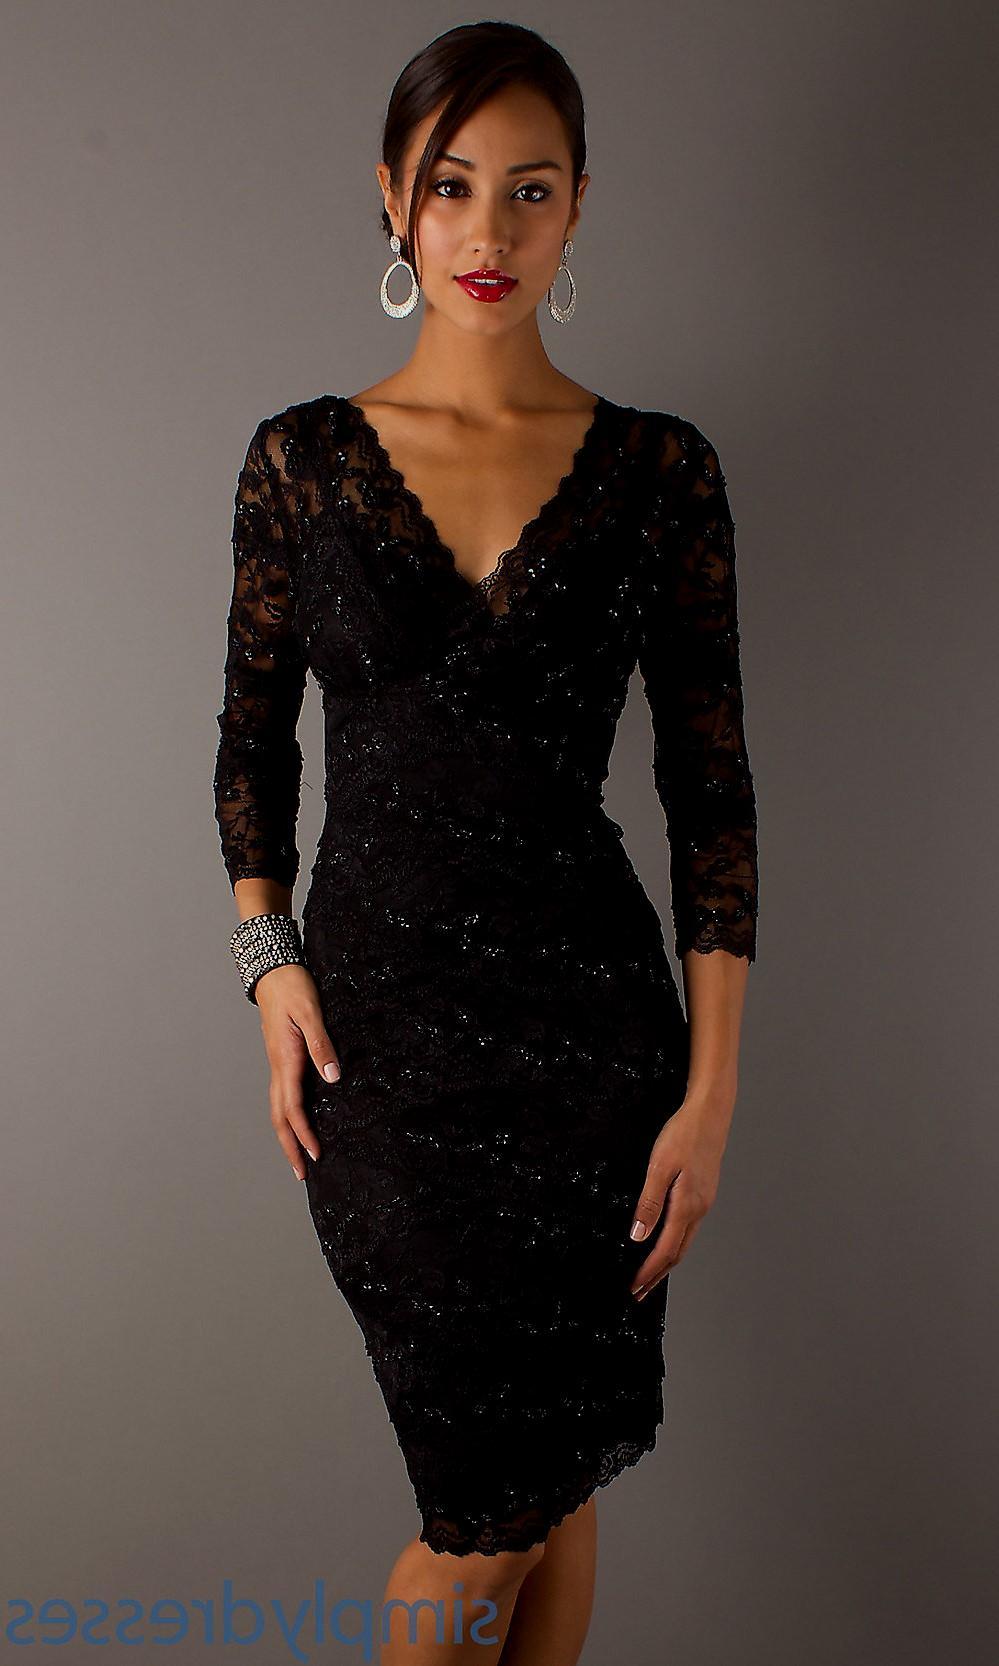 Paris Designer Black Cocktail Dress HD